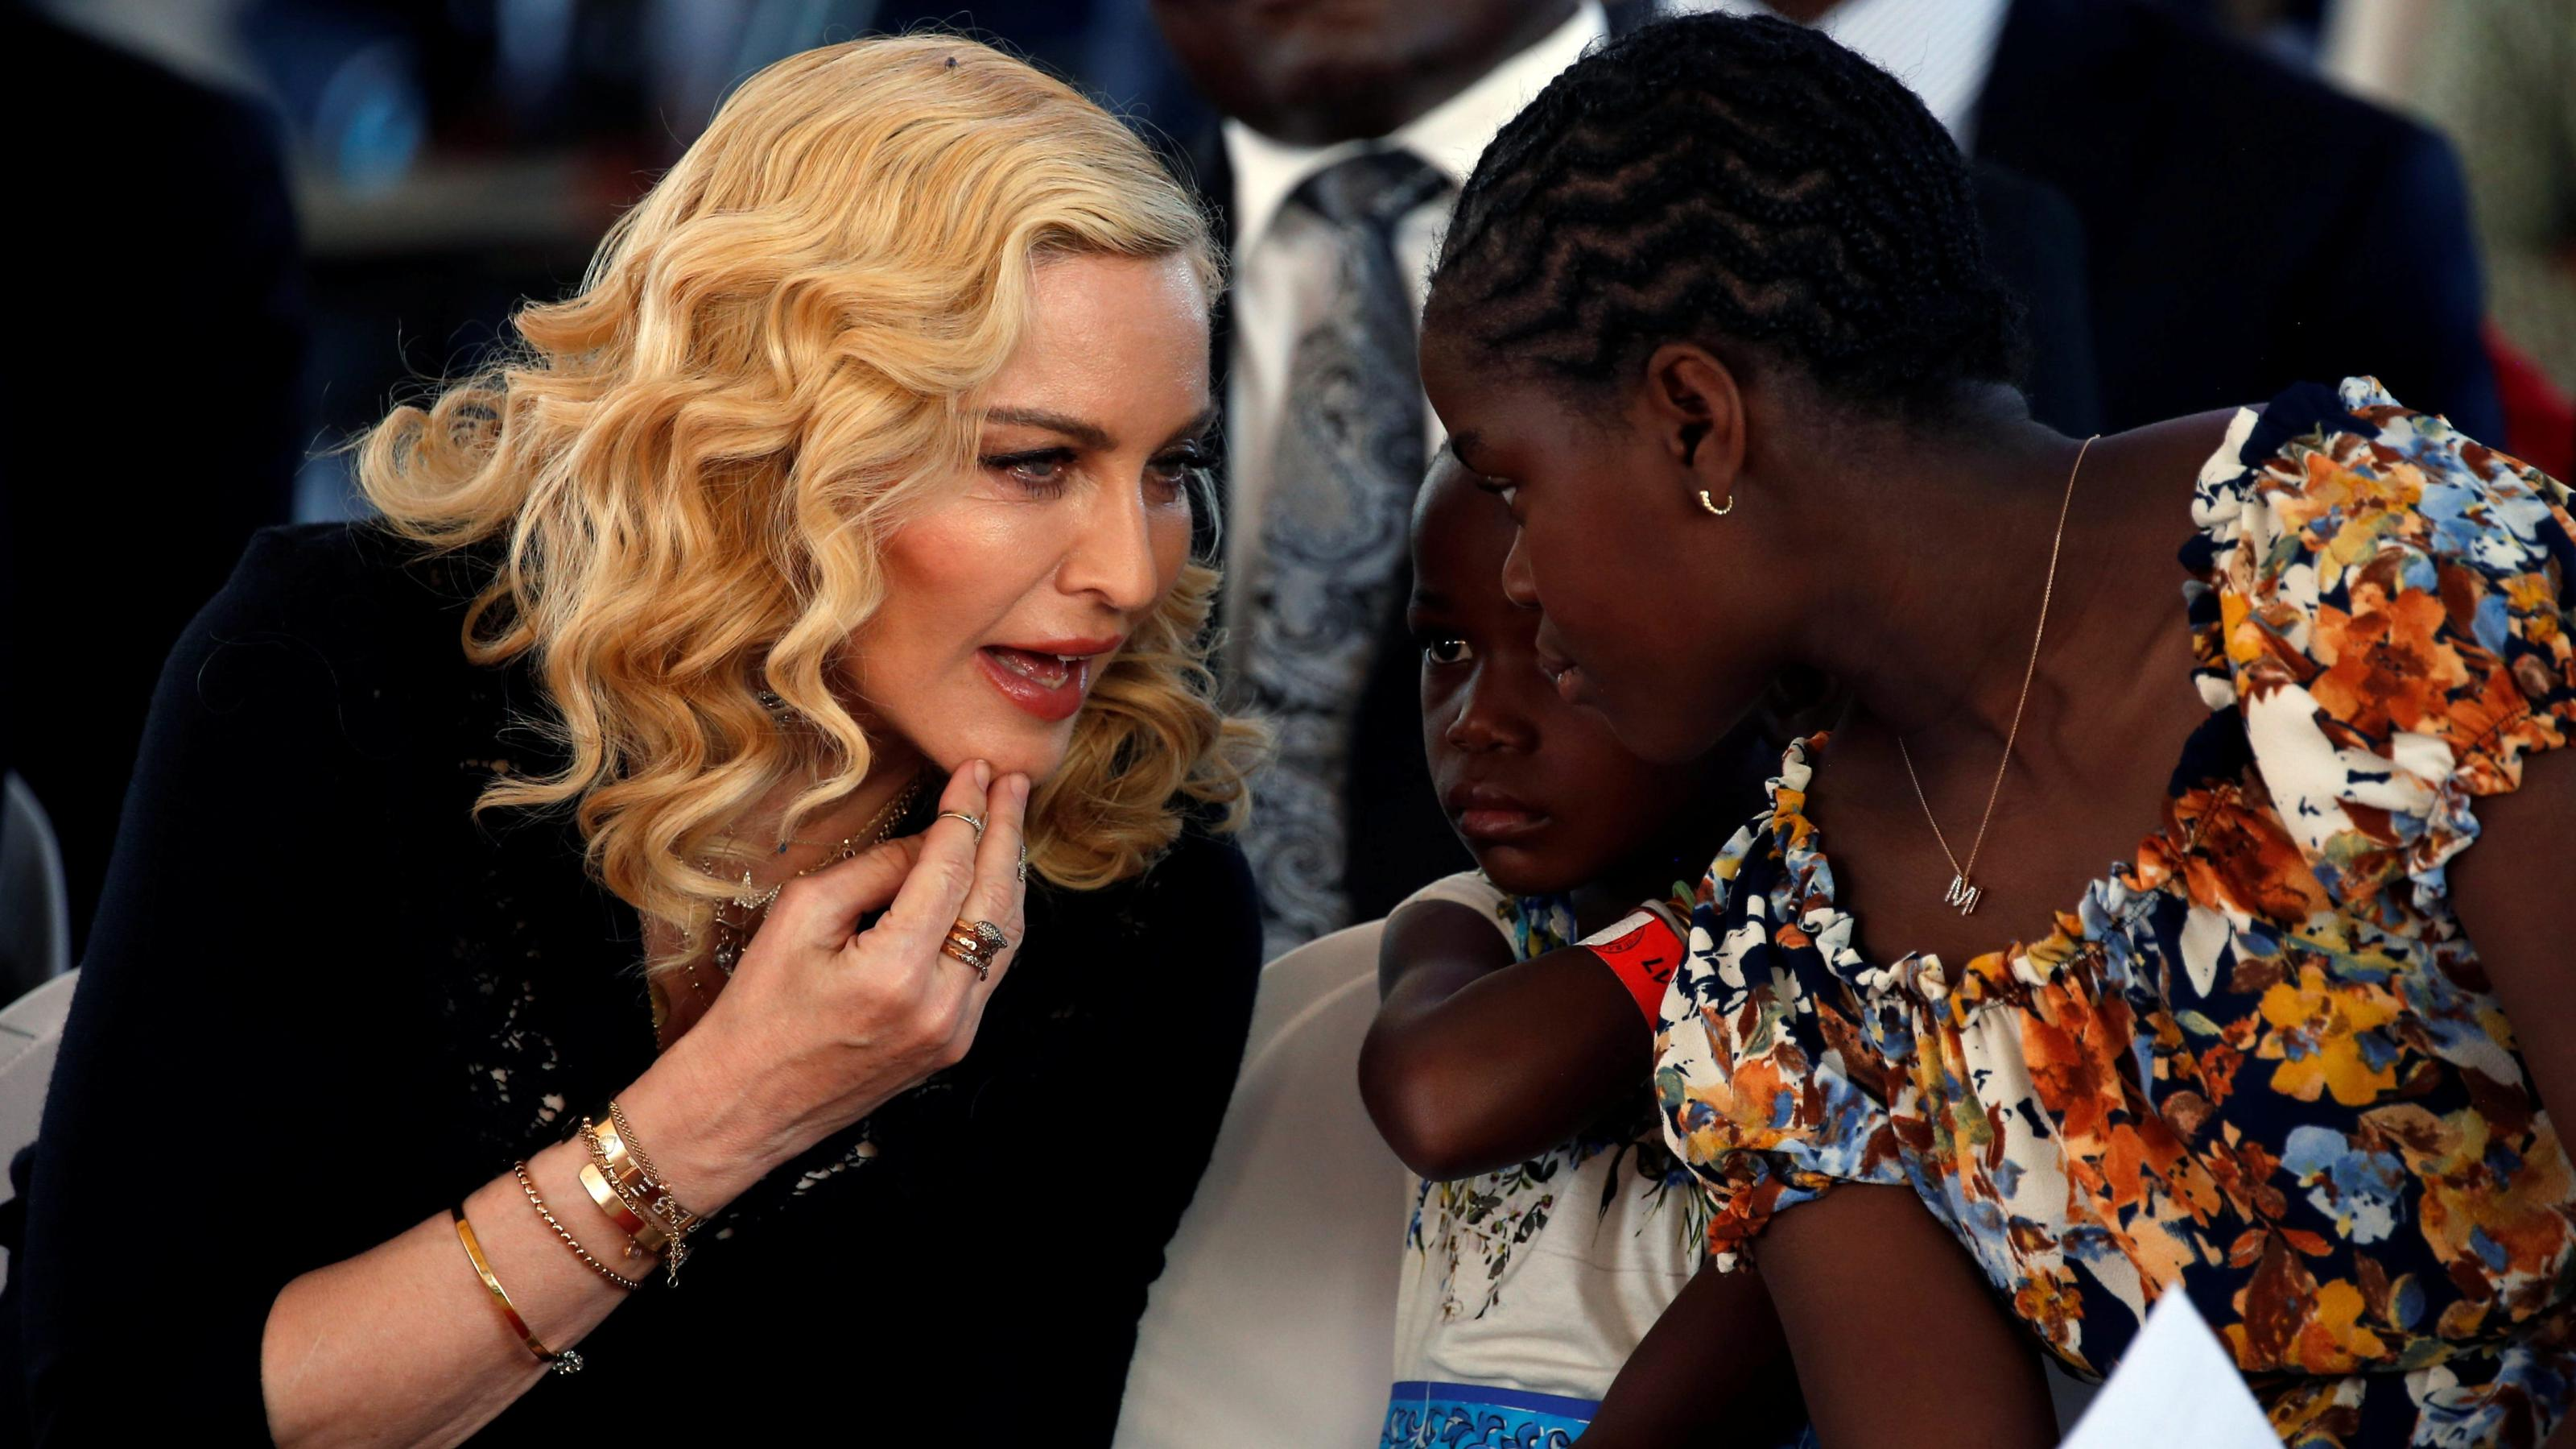 Madonna's advice on age, work, and creativity